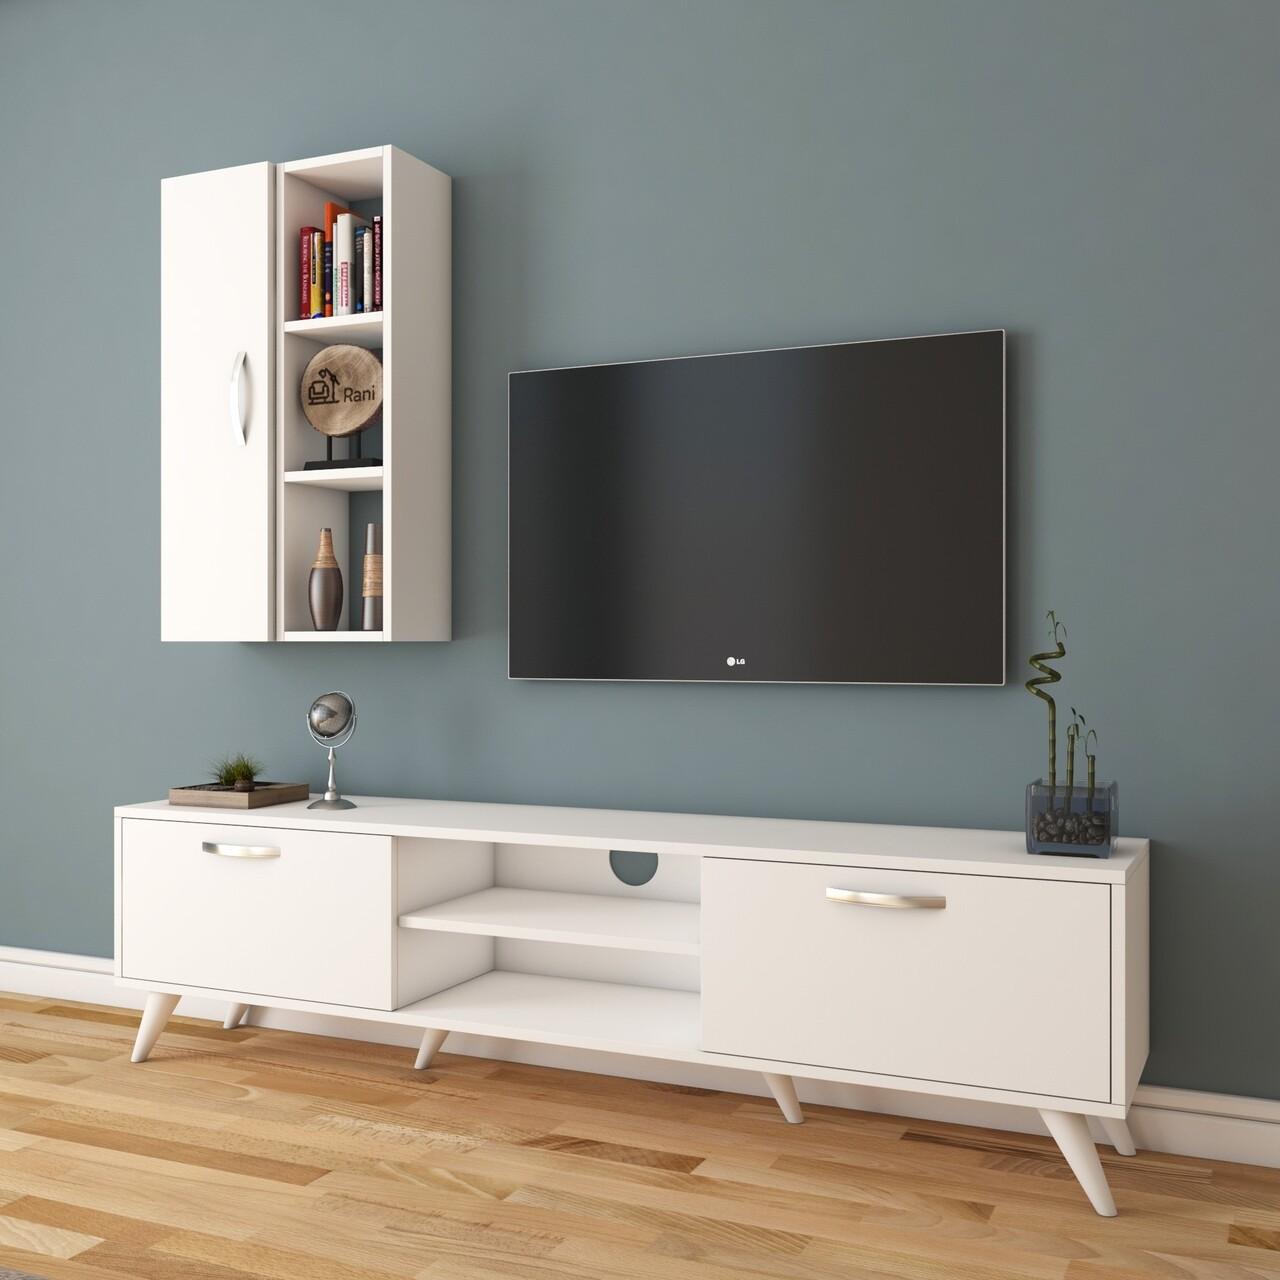 Comoda TV cu raft de perete si cabinet M37 - 301, Wren, 180 x 35 x 48.6 cm/90 cm, white